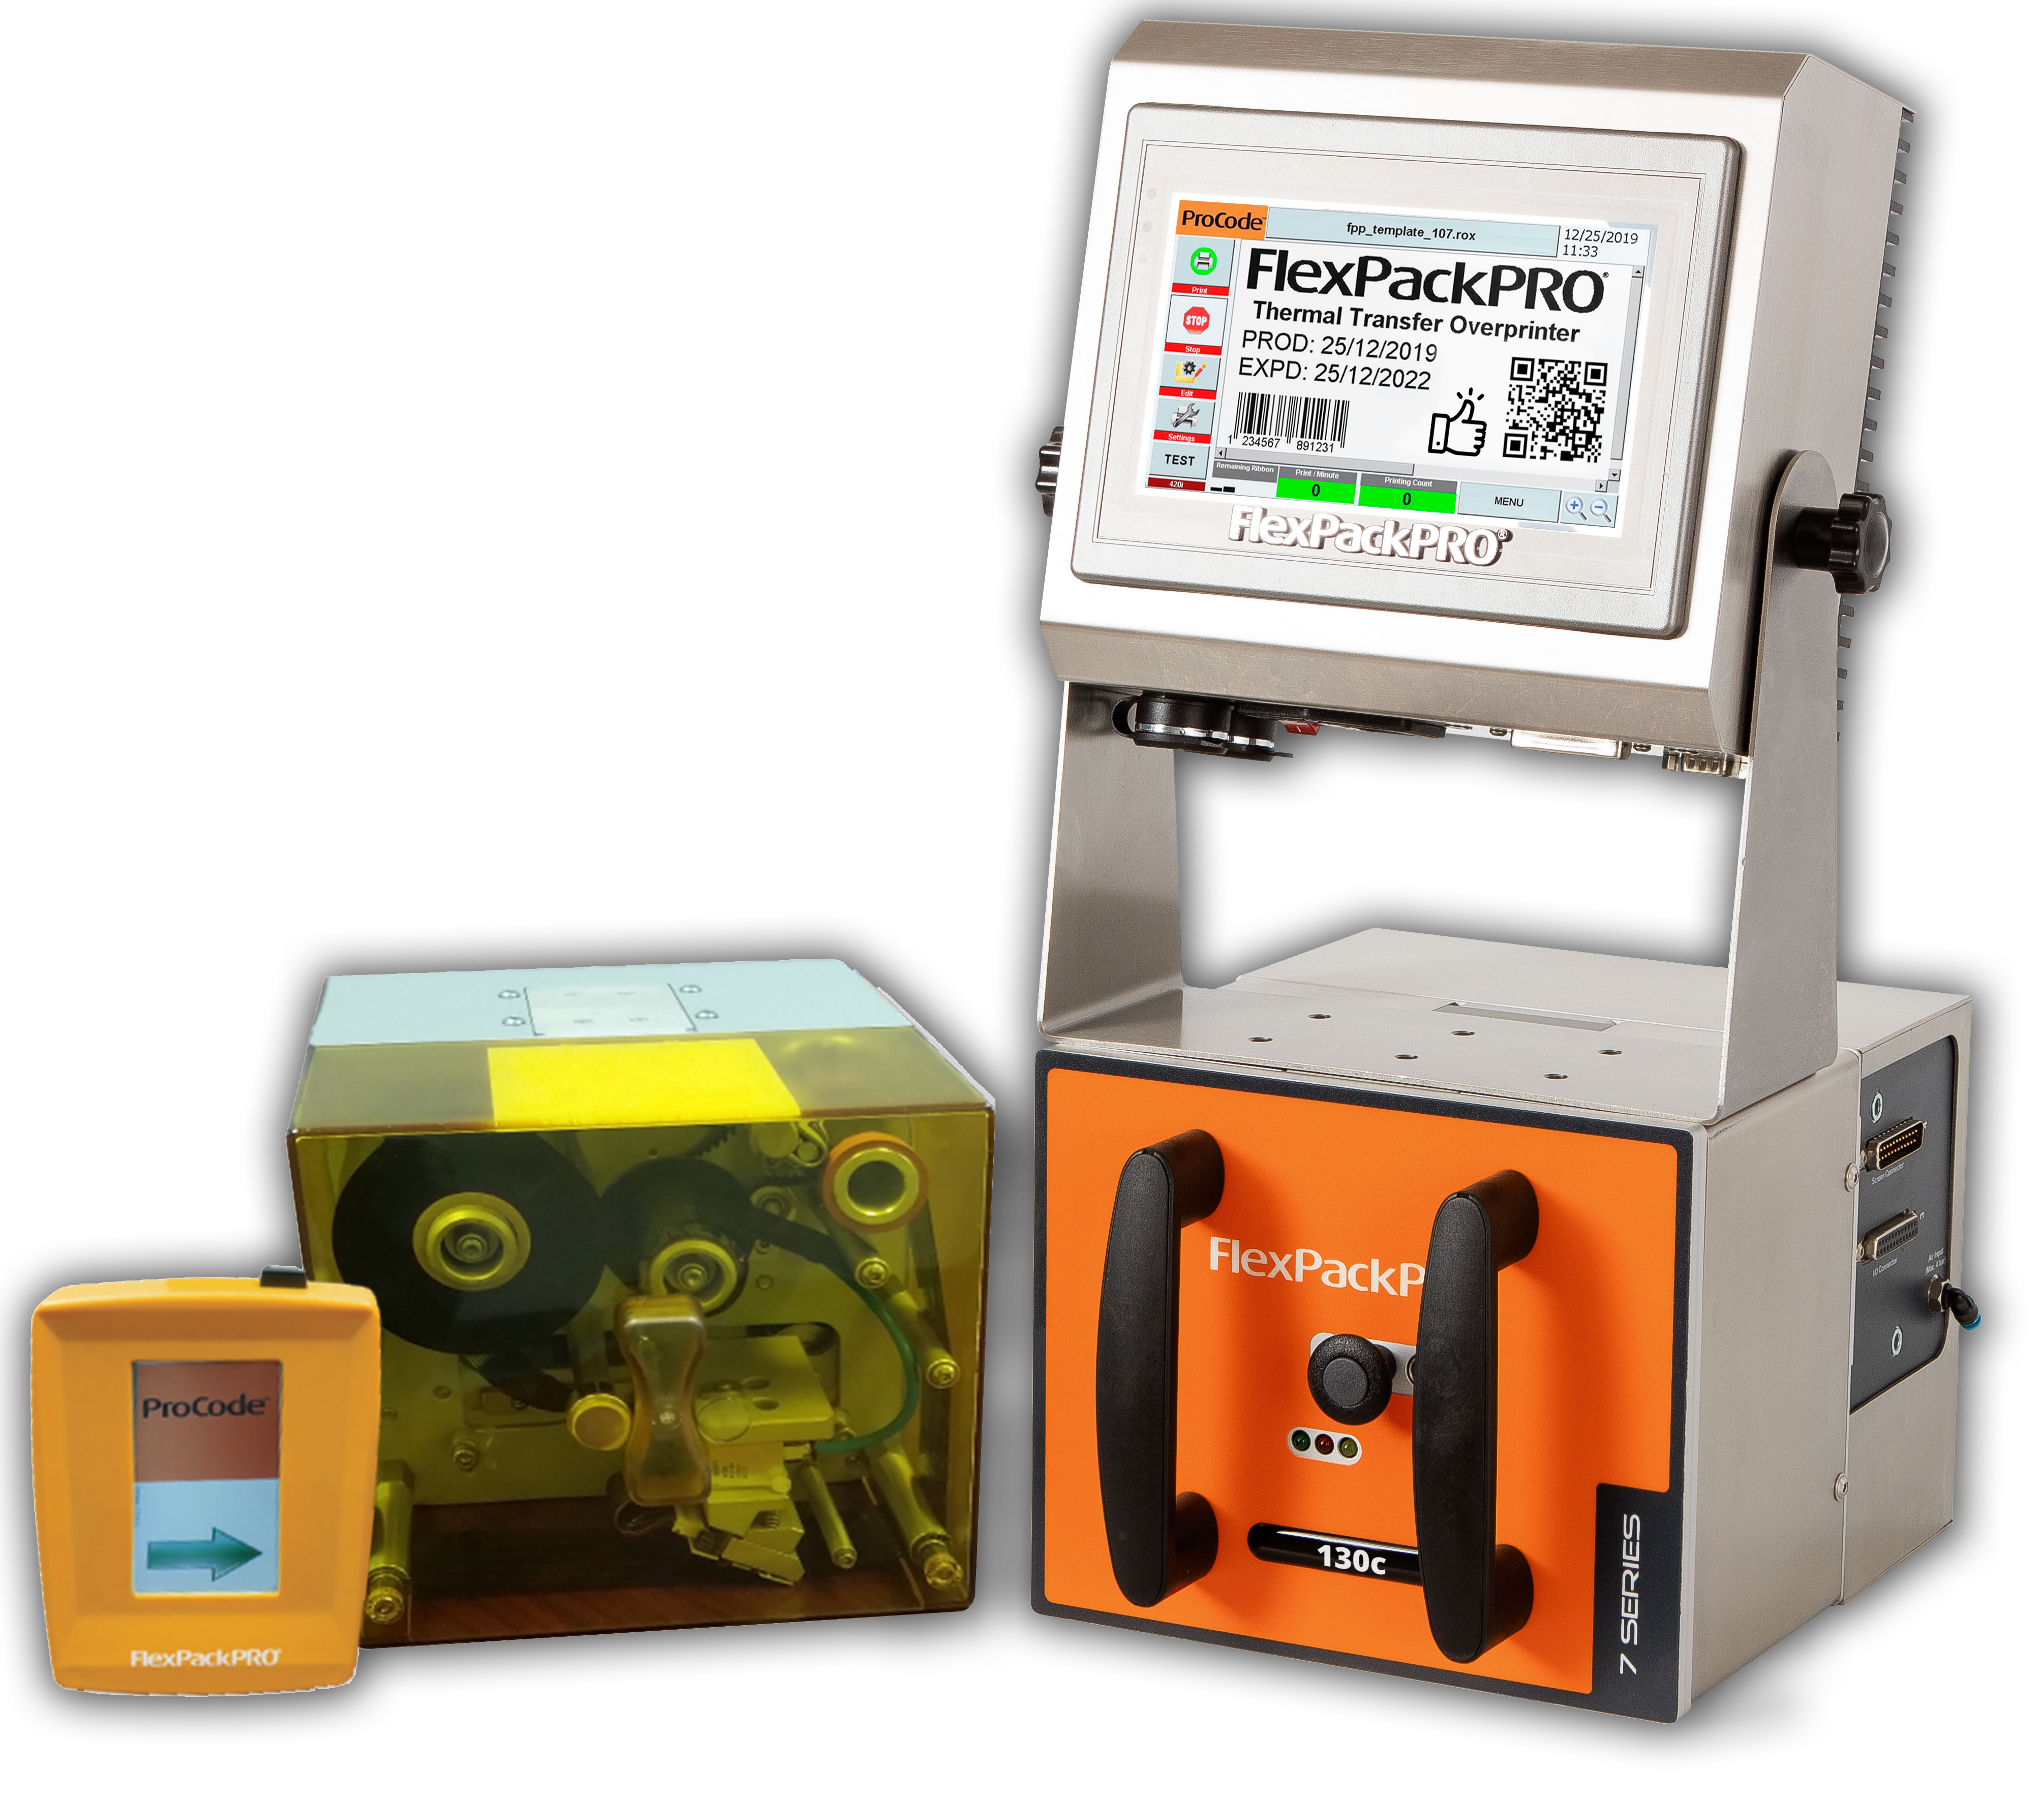 FlexPackPRO 32MM Thermal Transfer Printer